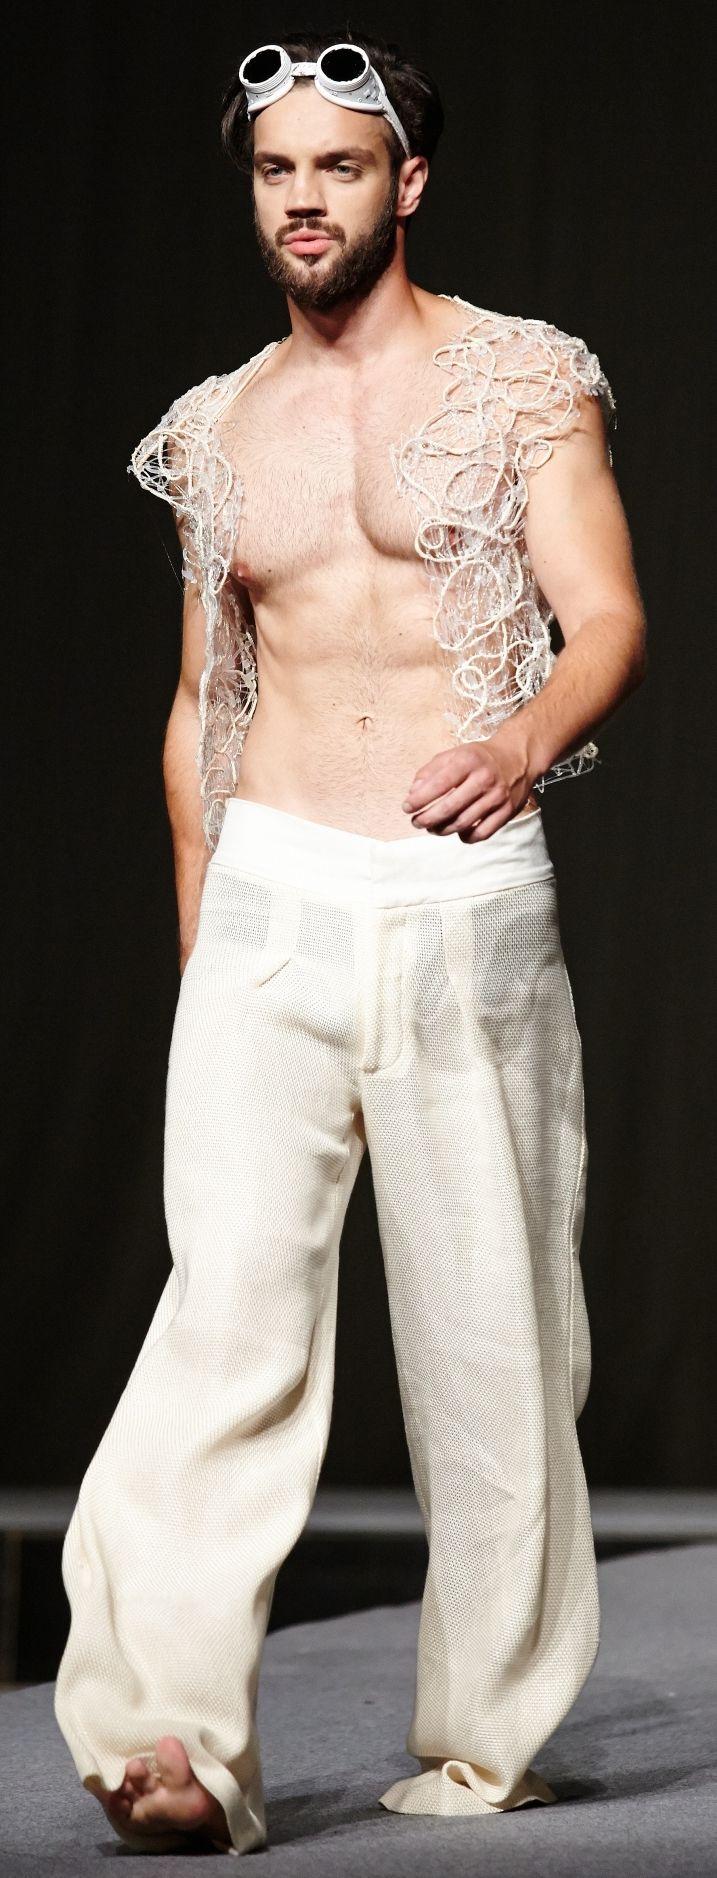 #textures #fabricsmorphology #male #model #artittude #catwalk #fashionshow #galamodauvt